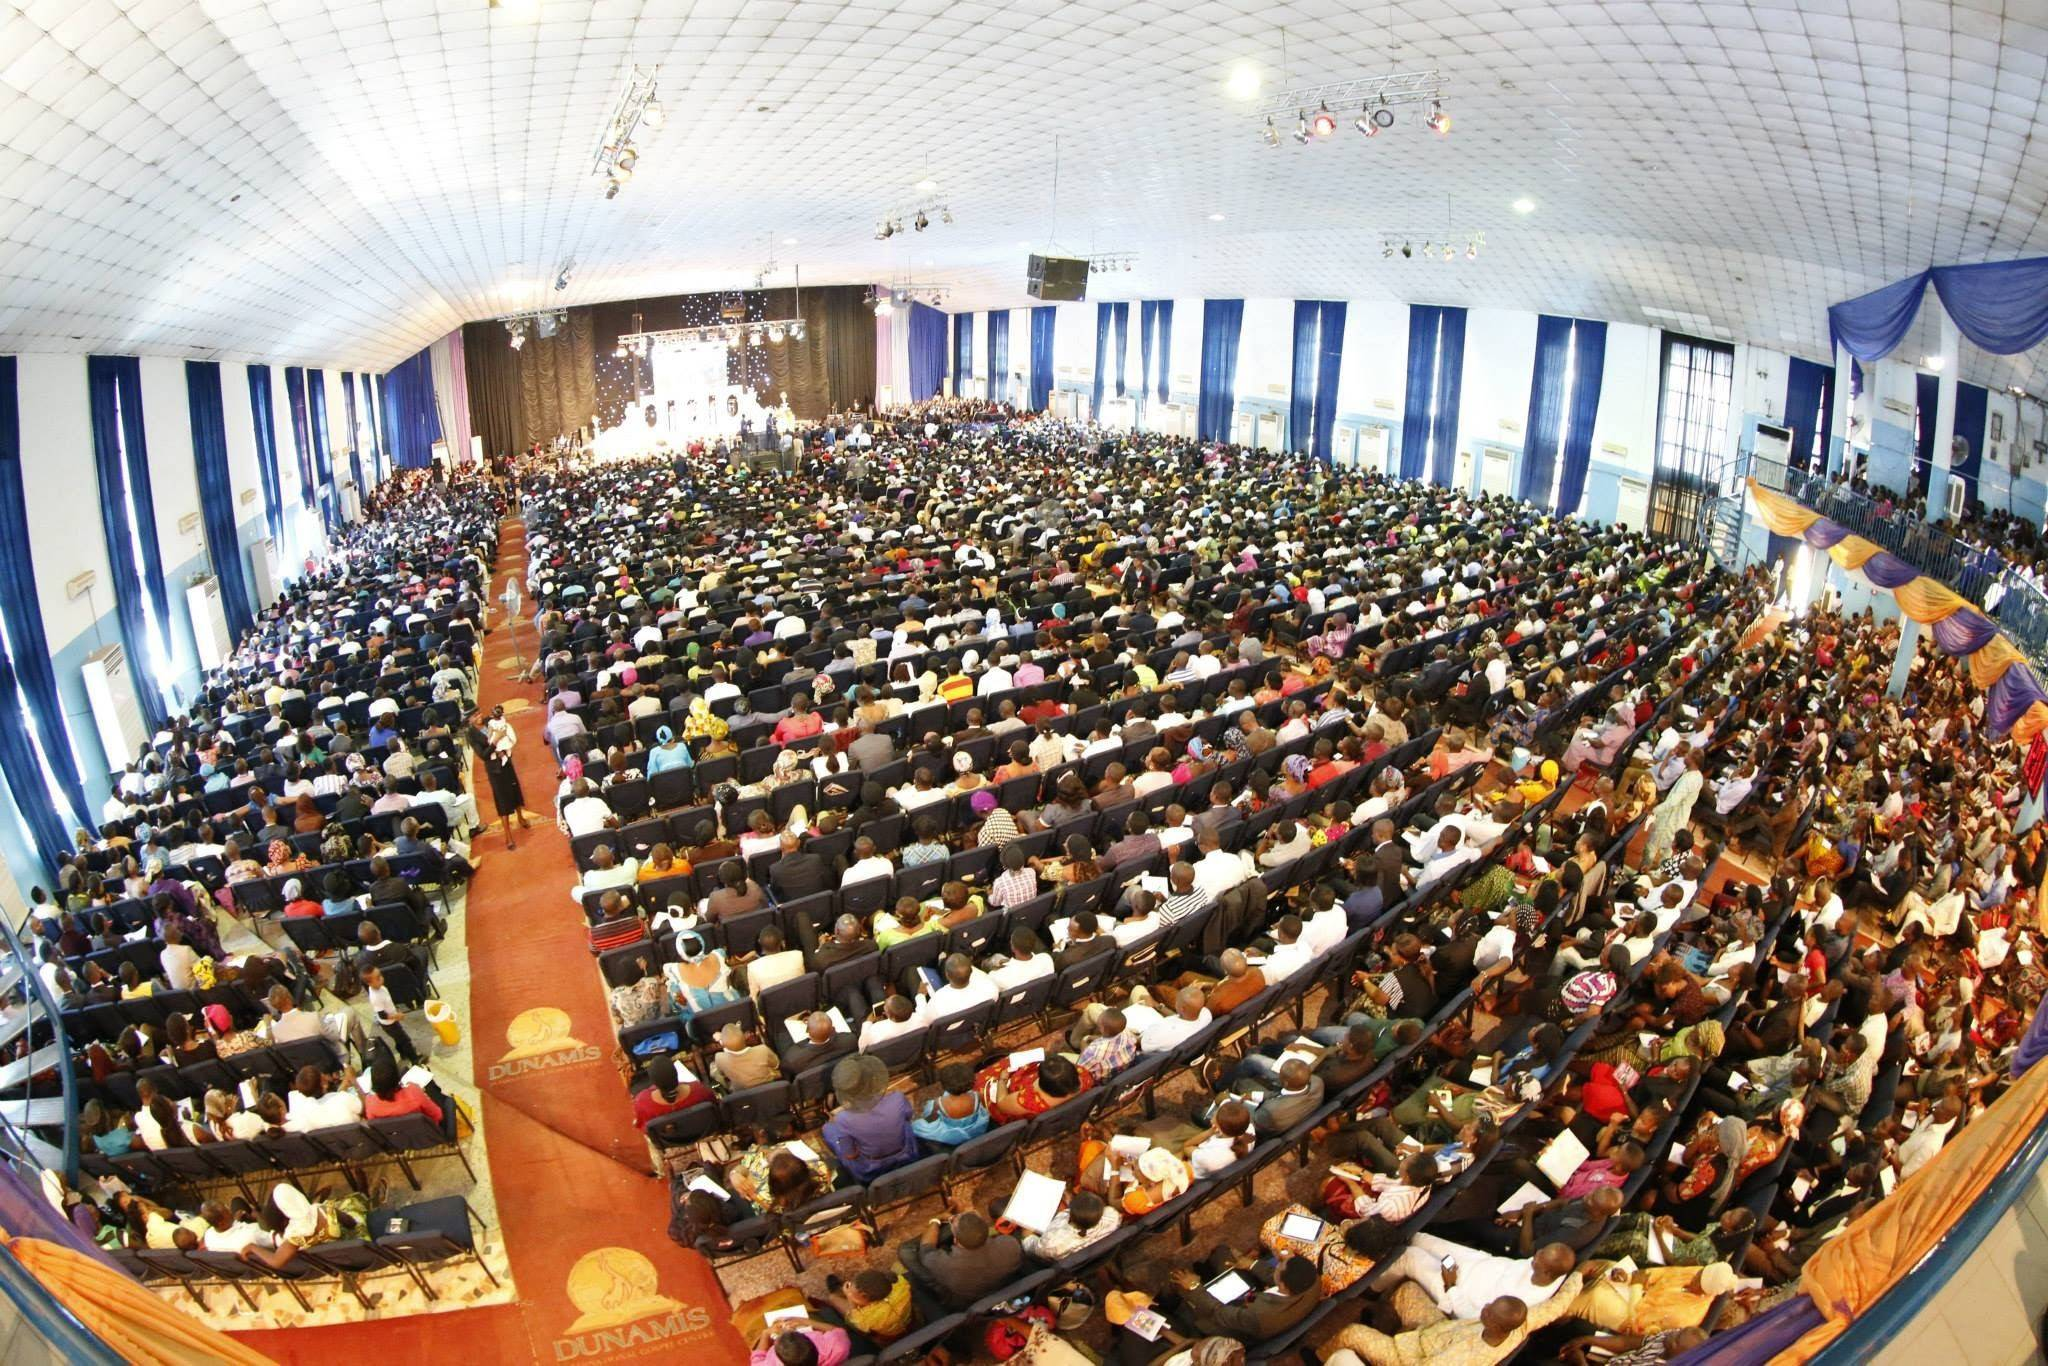 Dunamis International Gospel Centre, Abuja2